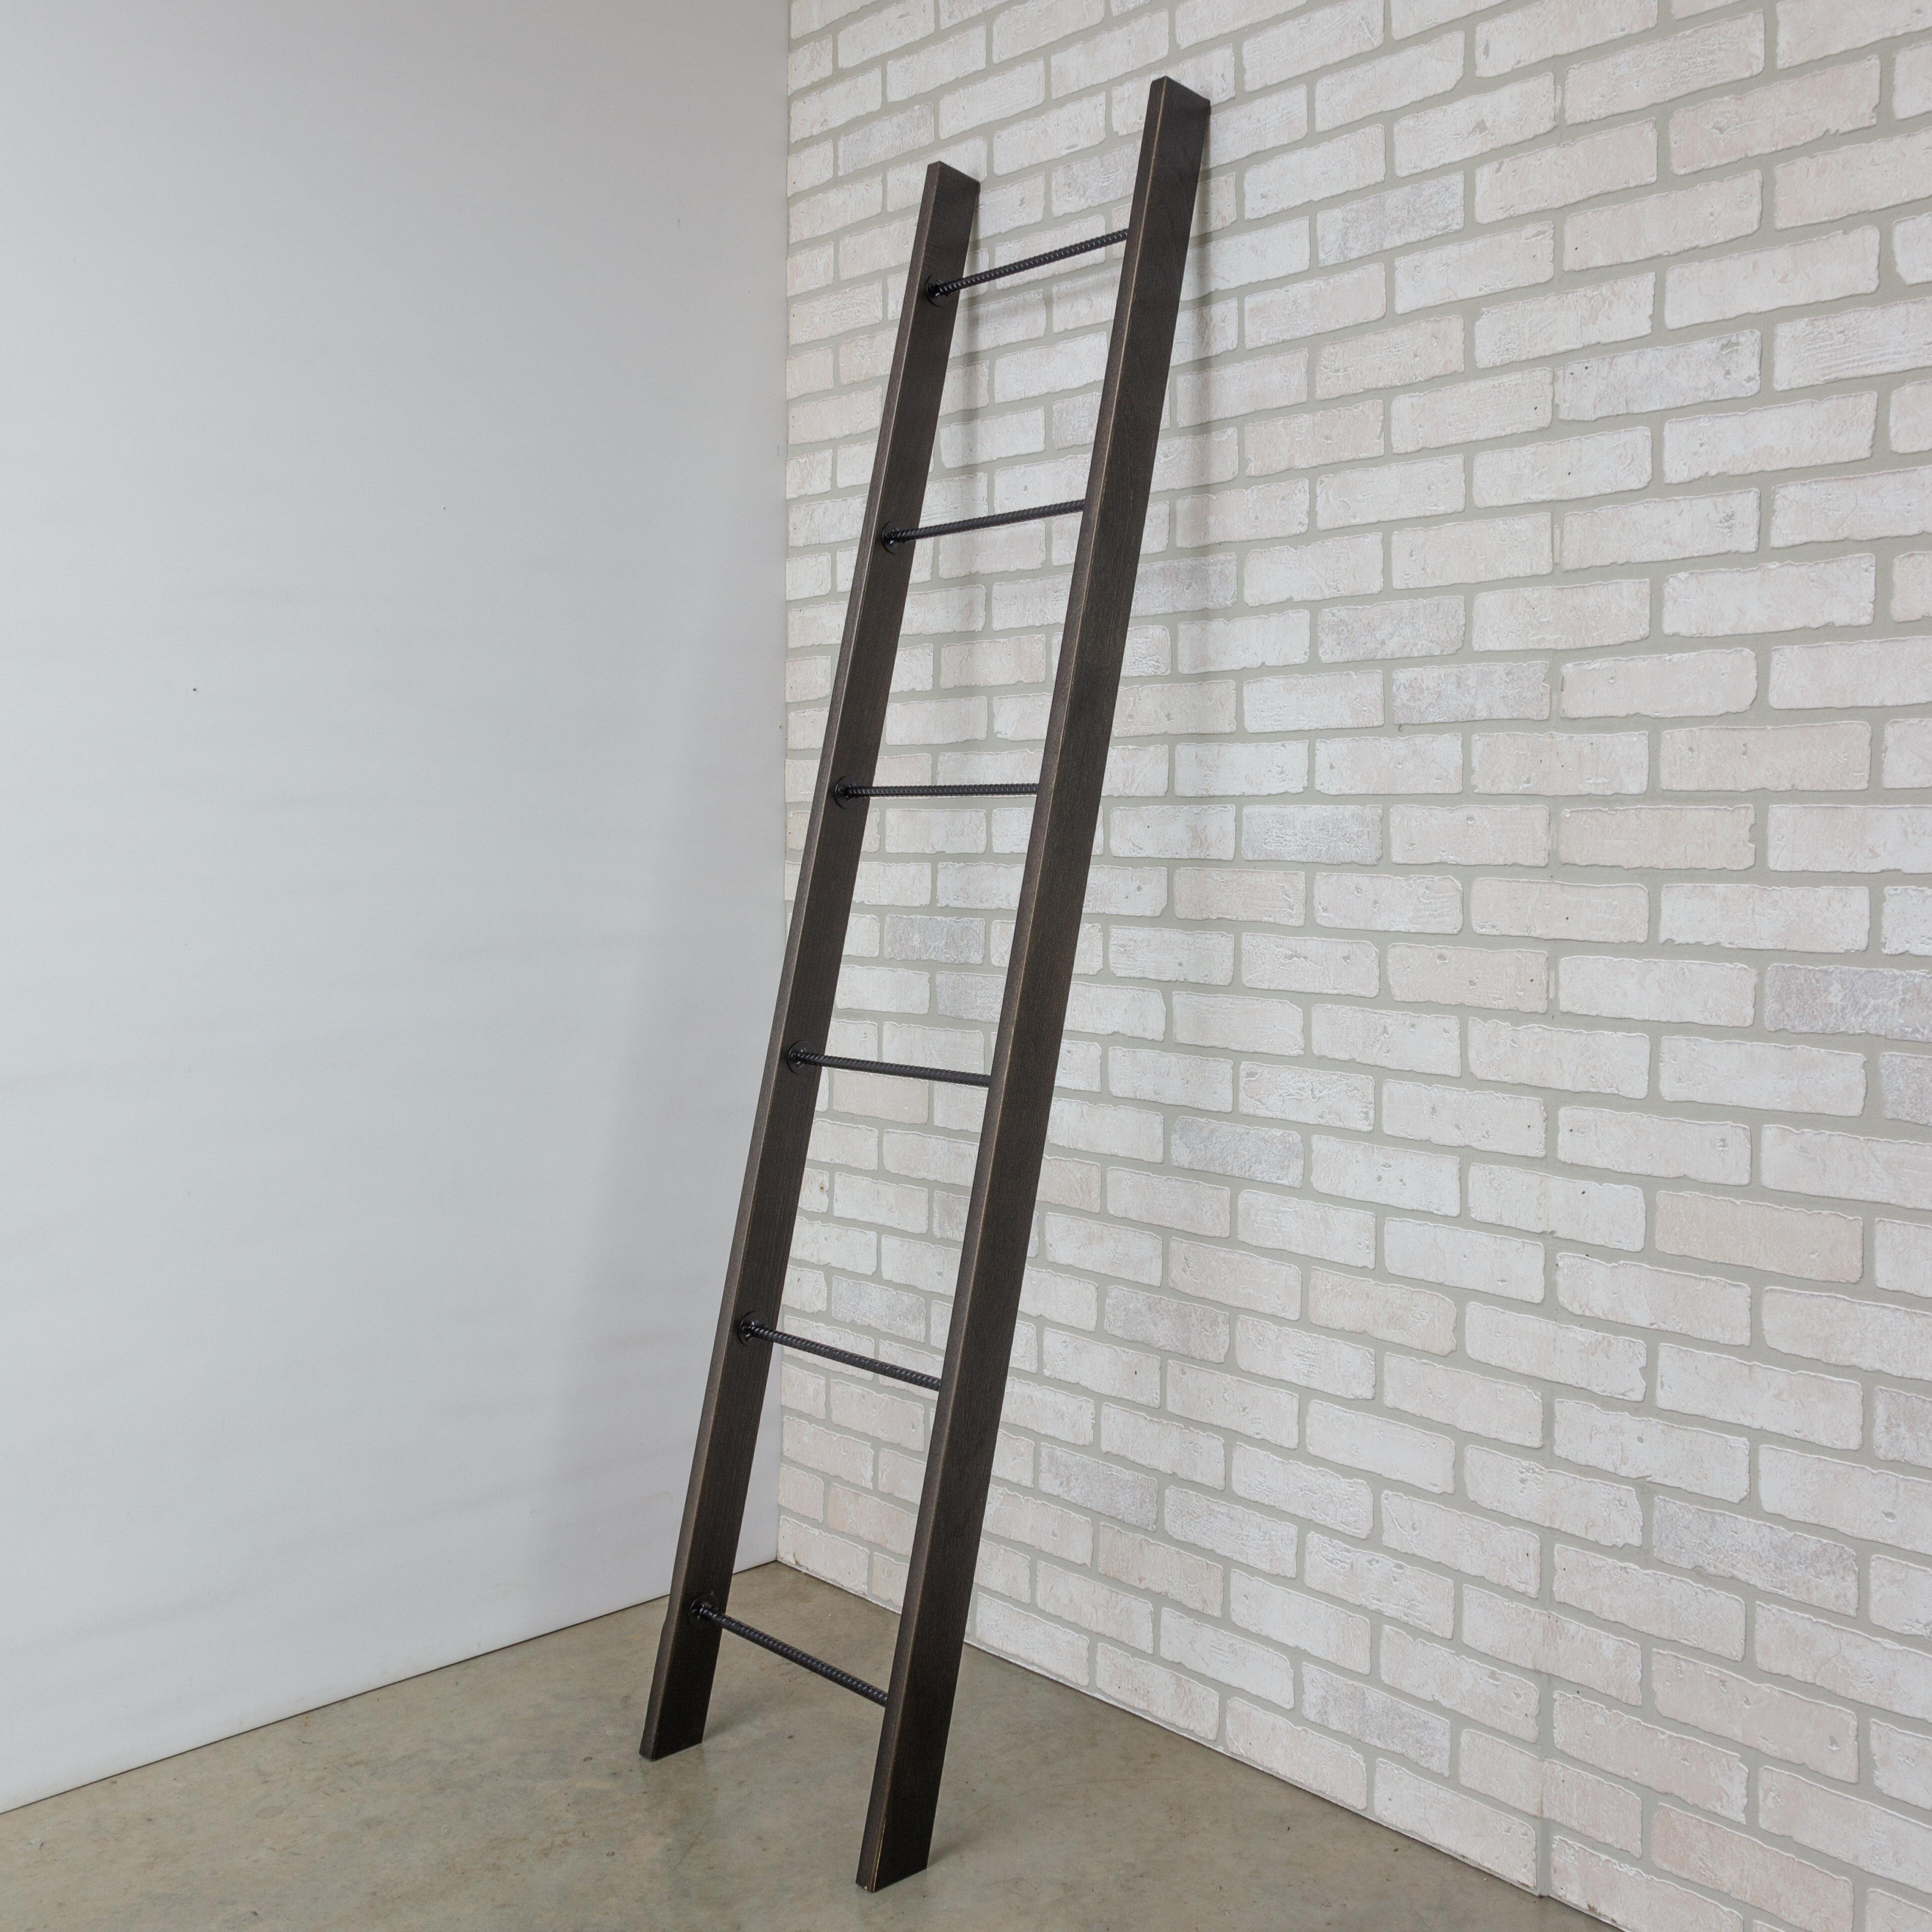 20 ft Blanket Ladder